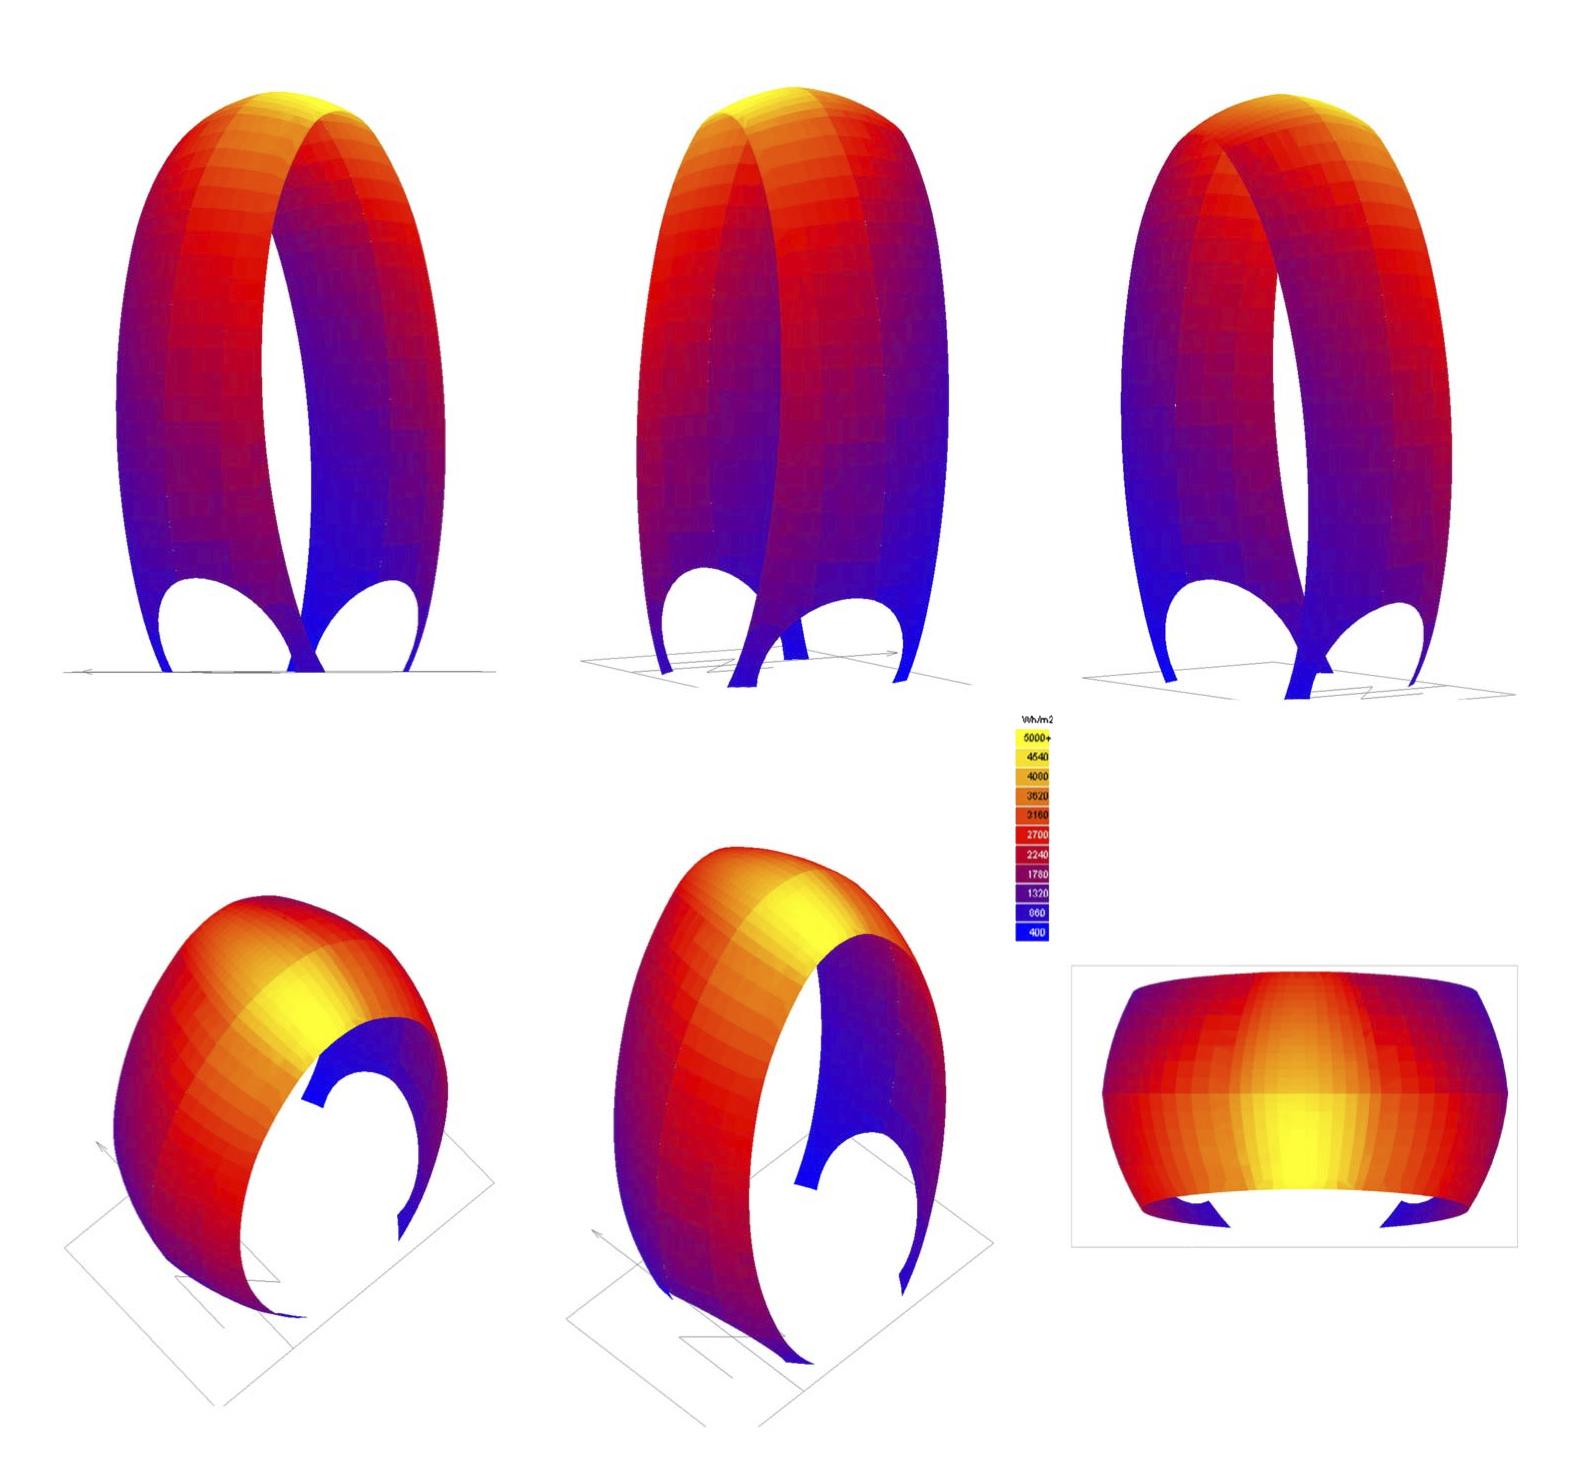 WKK Oval Limassol Shell Solar analysis diag 1.jpg